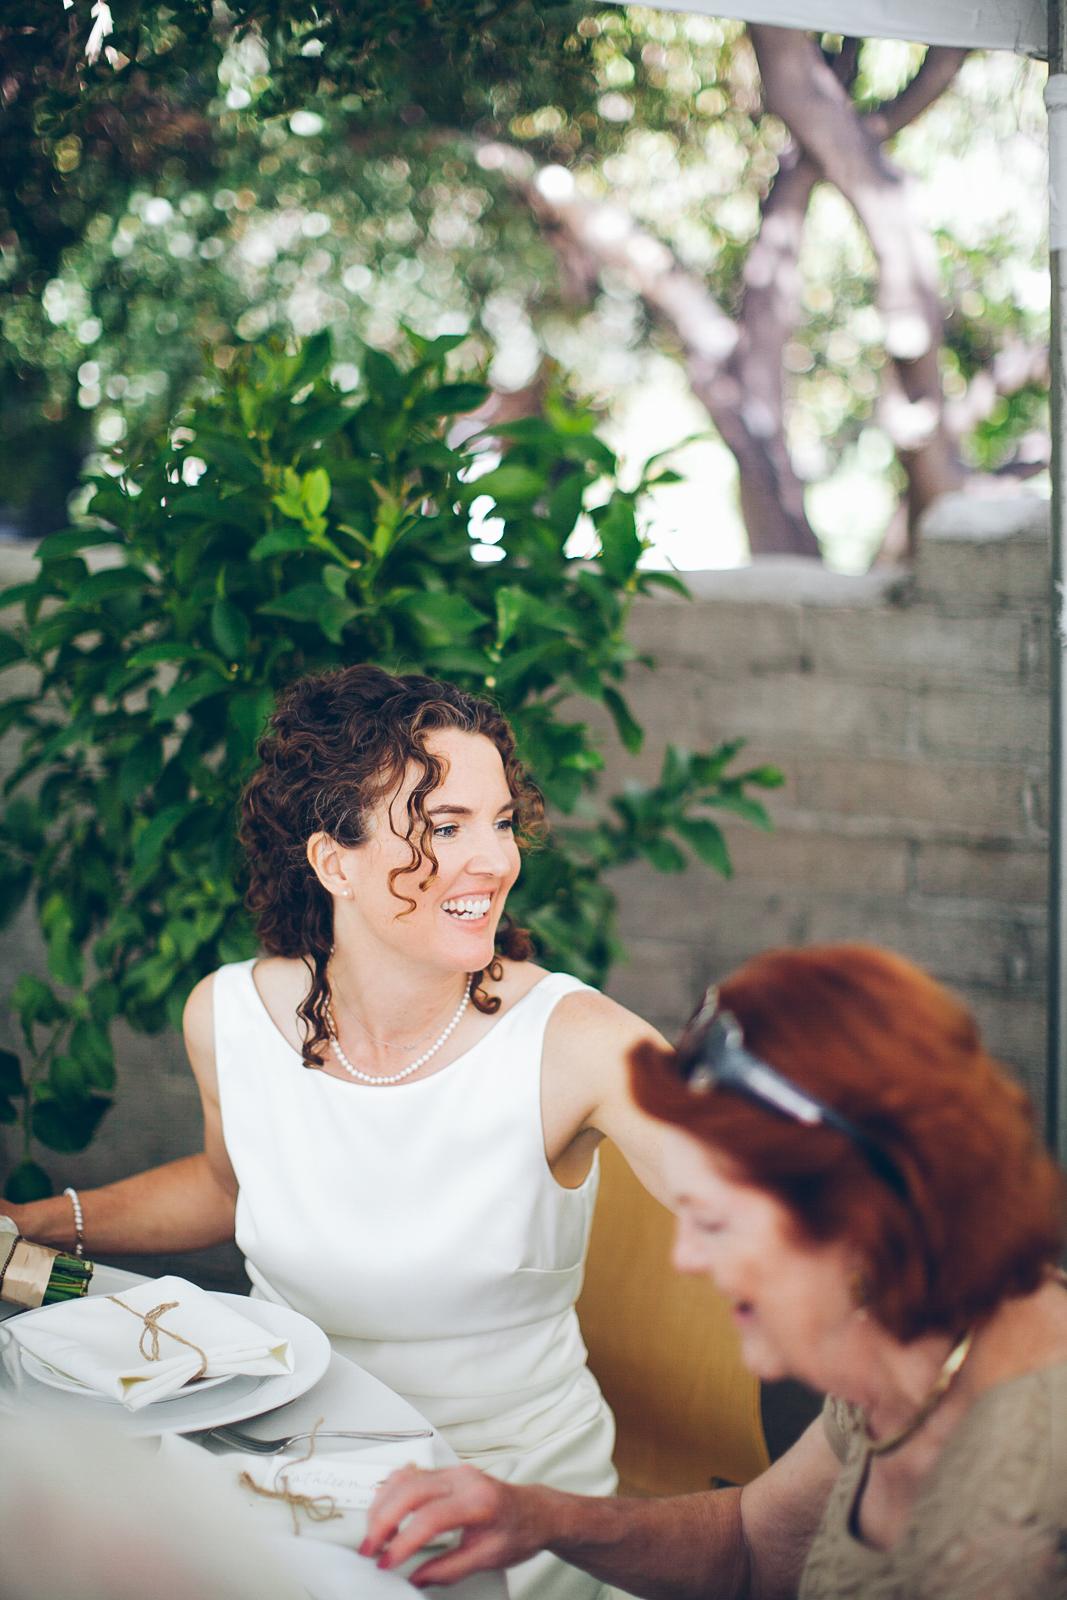 Riverside_ca_wedding_photography_marguerite_carolyn_ebony_siovhan_bokeh_photography_47.jpg